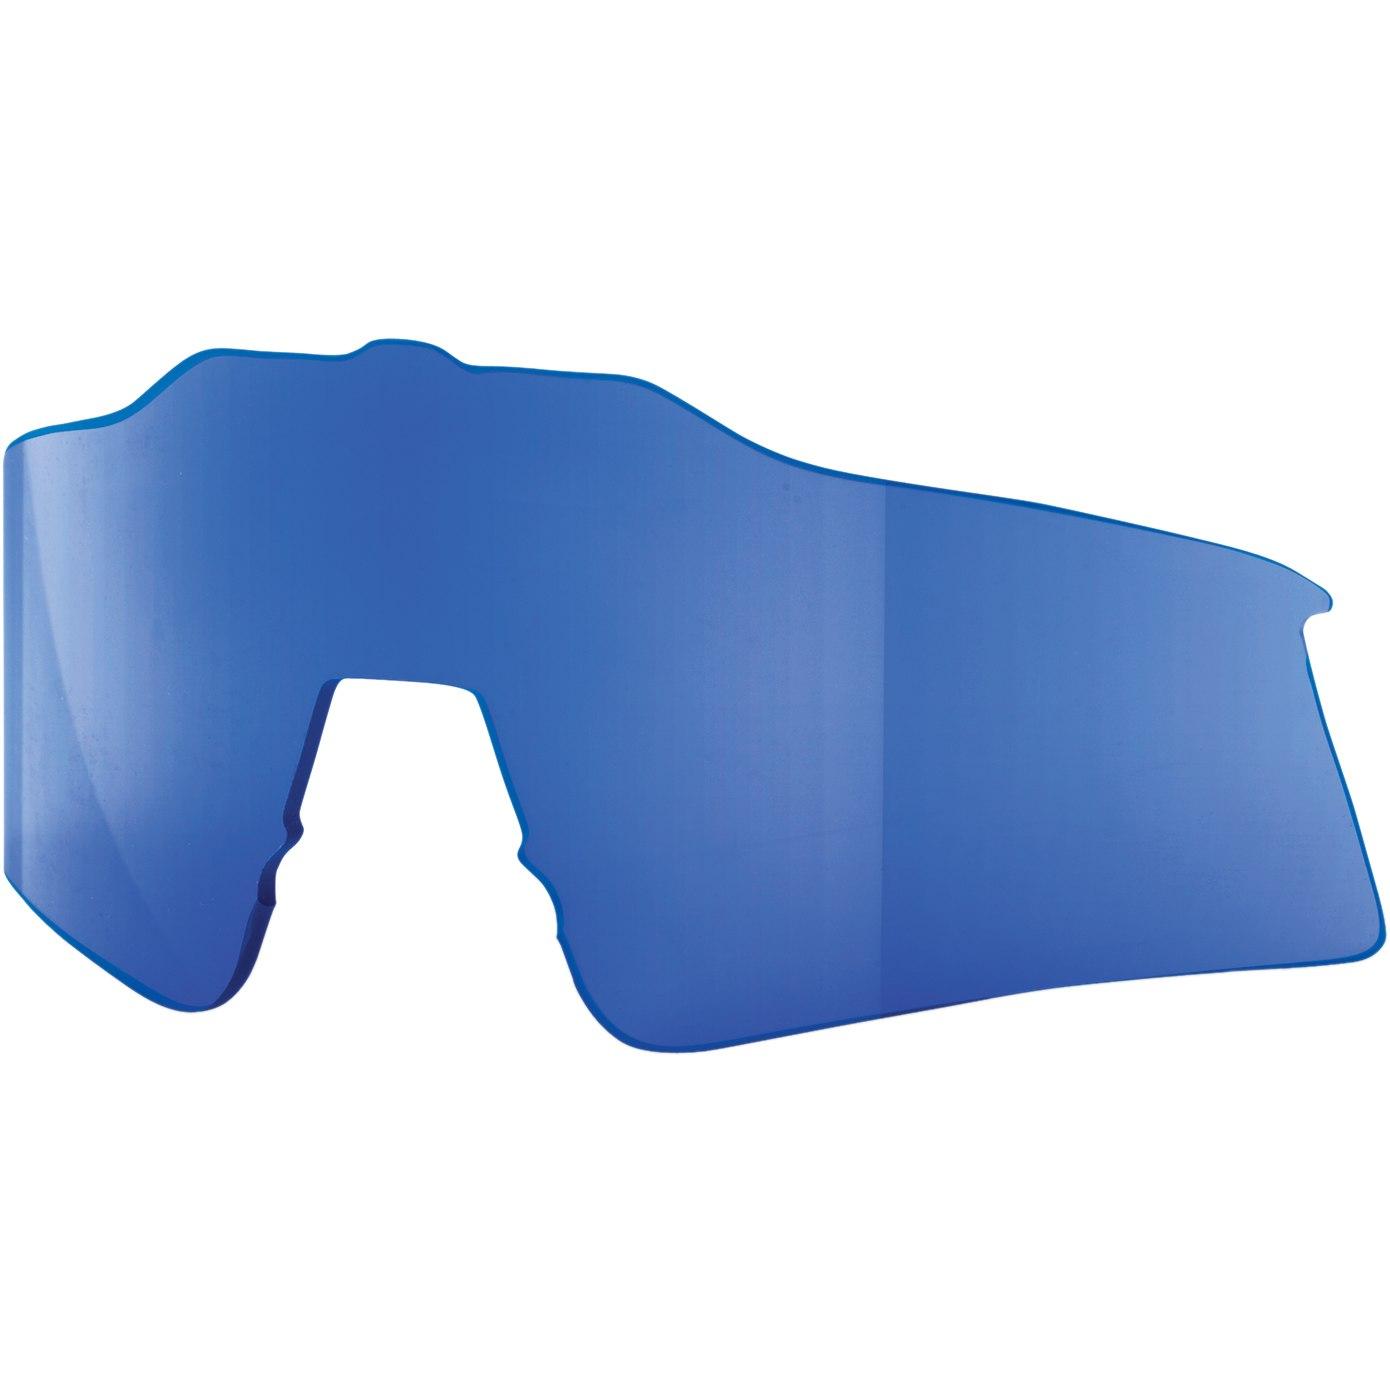 100% Speedcraft Small HiPER Mirror Replacement Lens - HiPER Blue Mirror